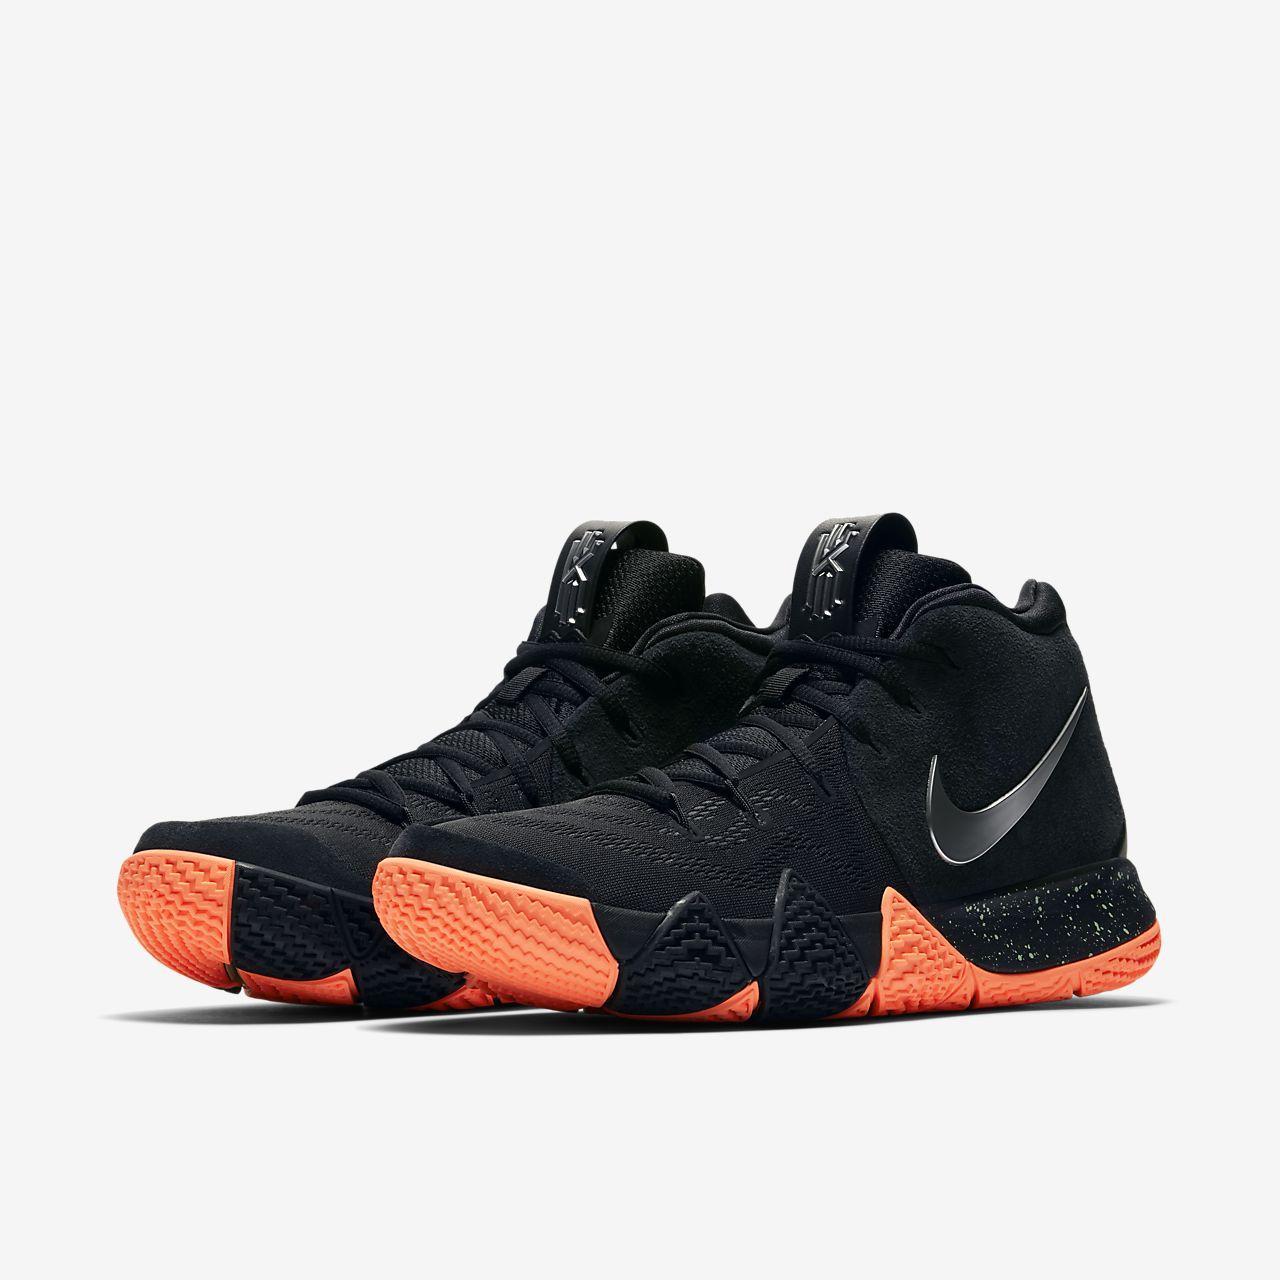 01-nike-kyrie-4-black-silver-orange-943806-010